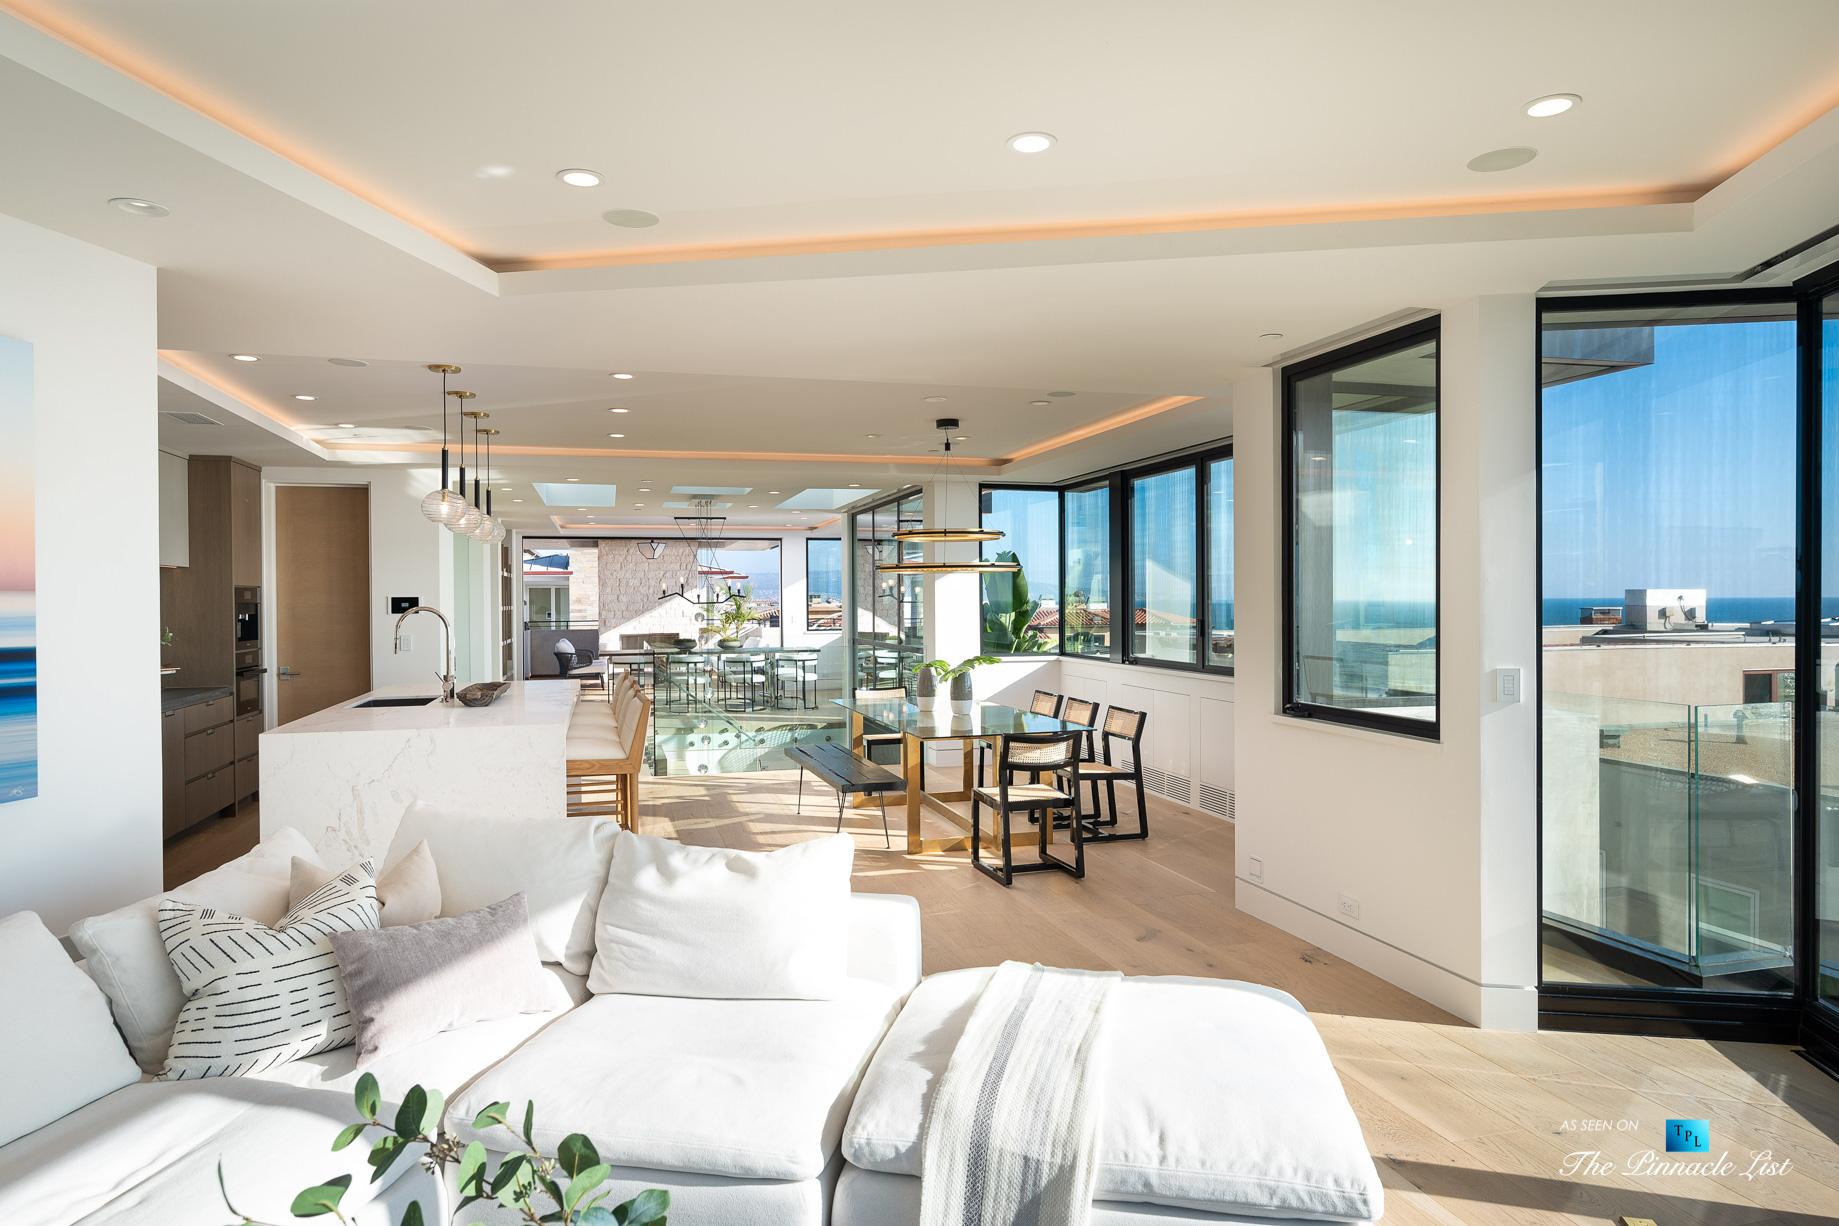 2016 Ocean Dr, Manhattan Beach, CA, USA – Living Room and Kitchen – Luxury Real Estate – Modern Ocean View Home